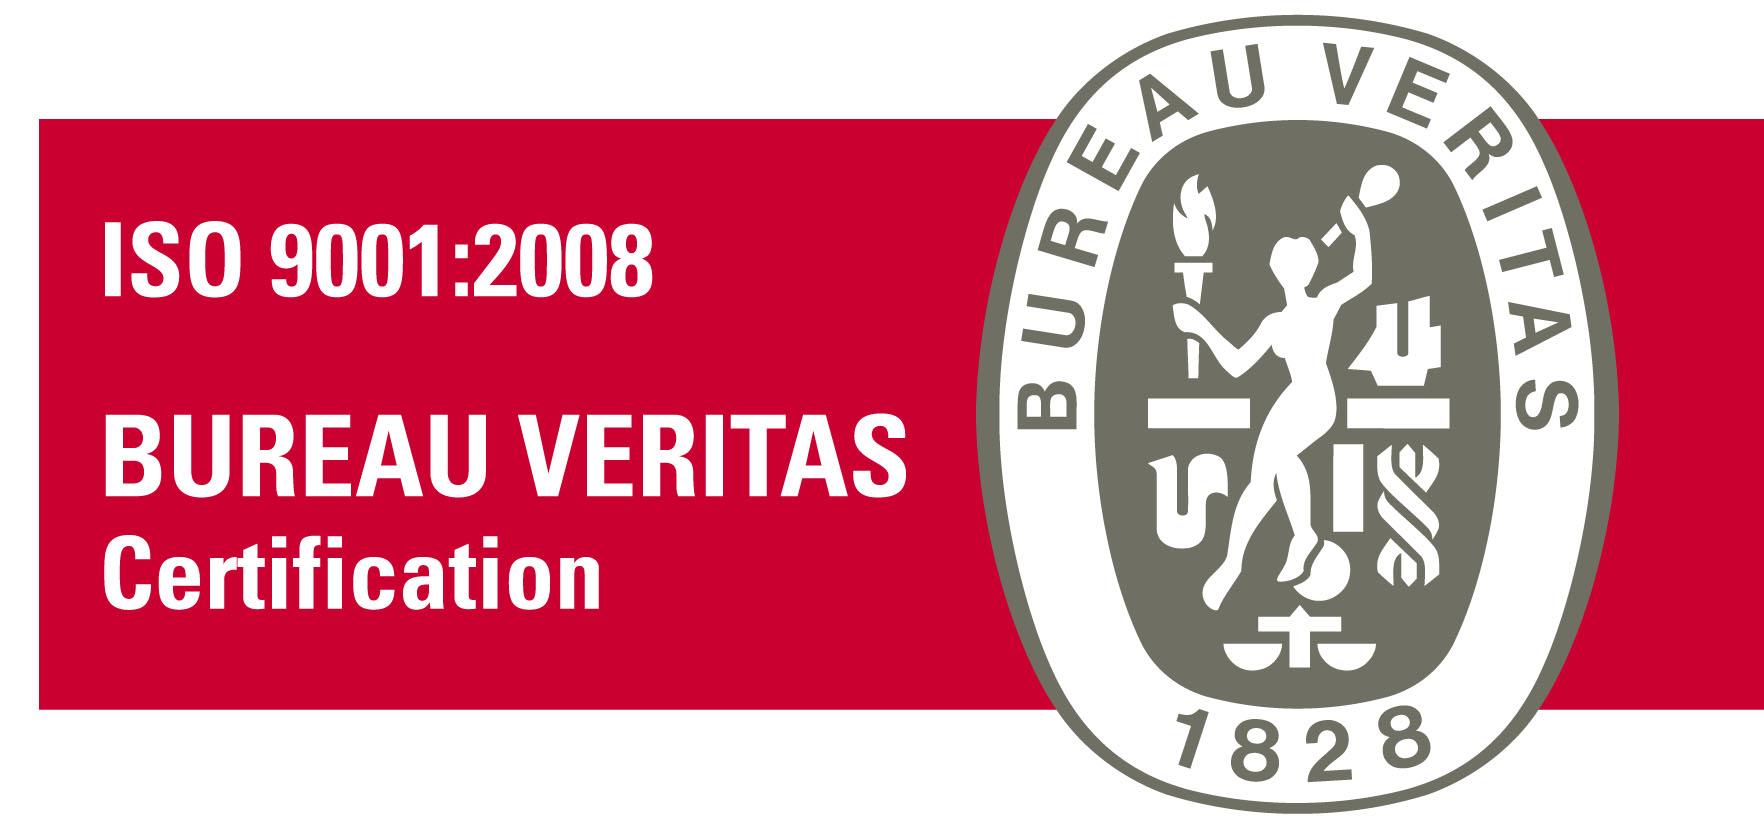 BV_Certification_IRIS